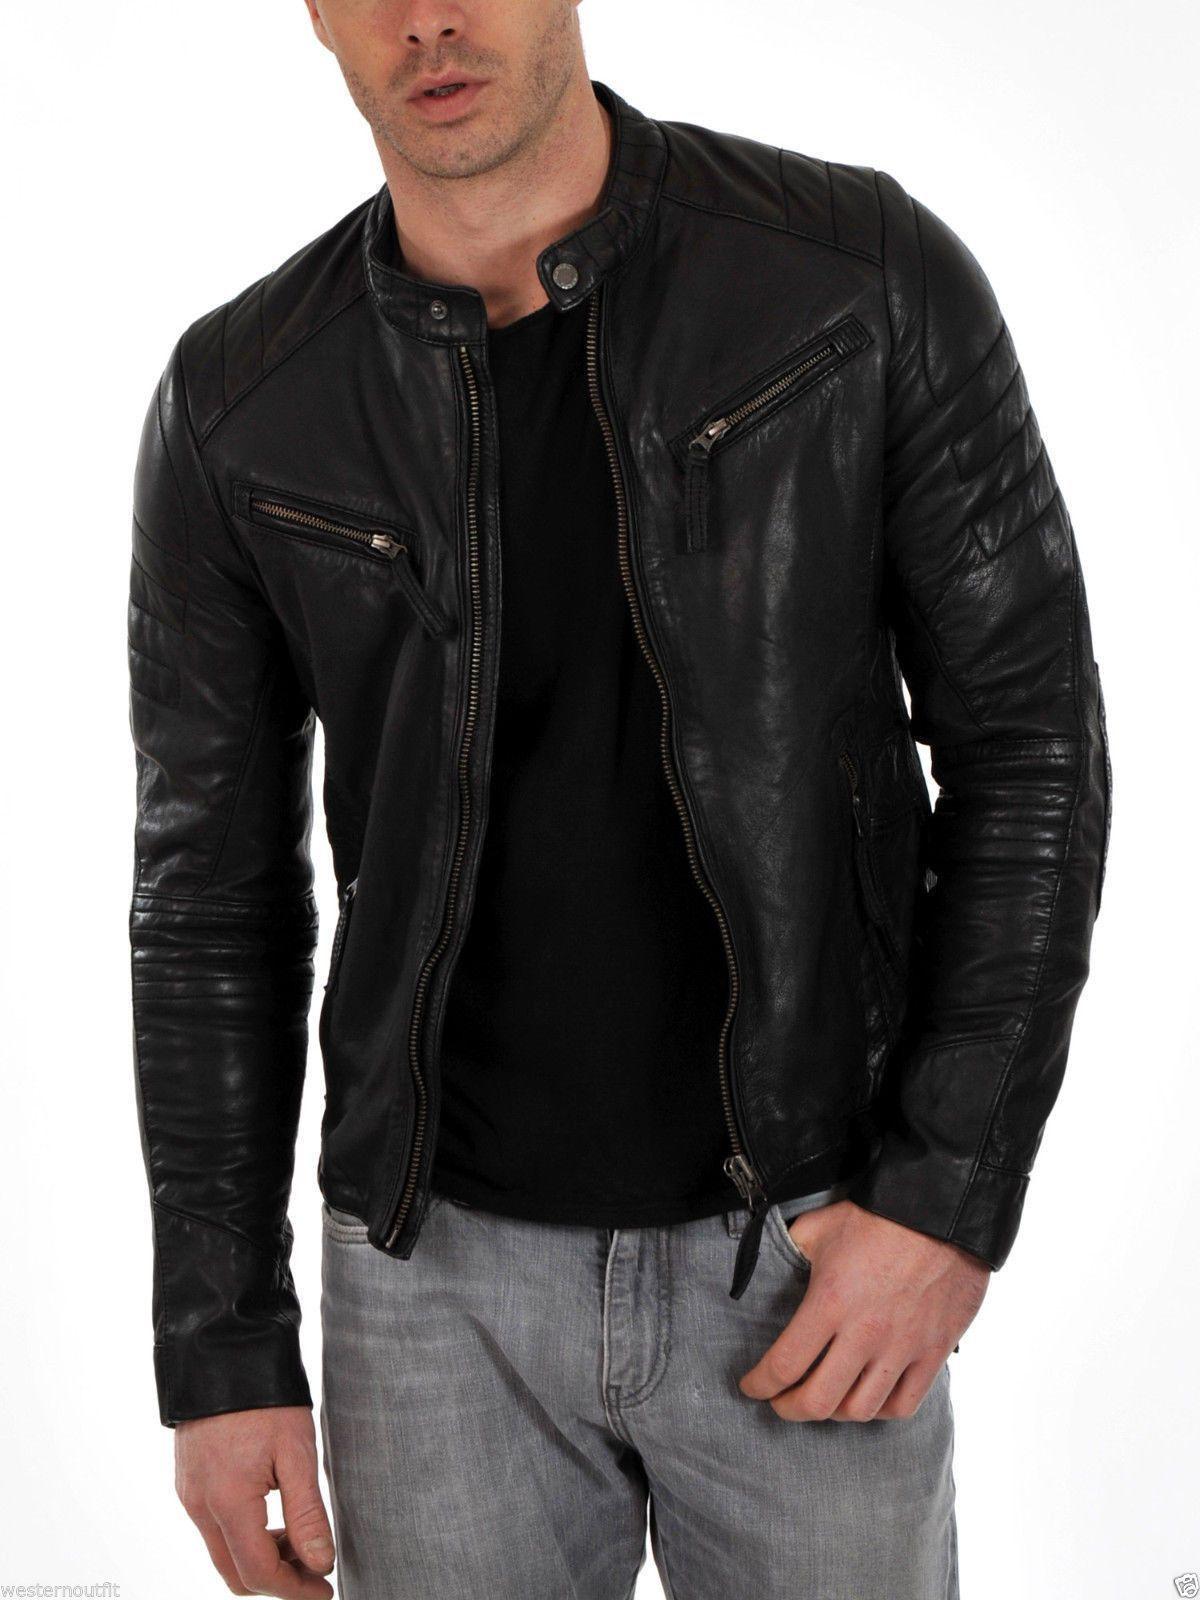 Men's Genuine Lambskin Leather Motorcycle Jacket Black